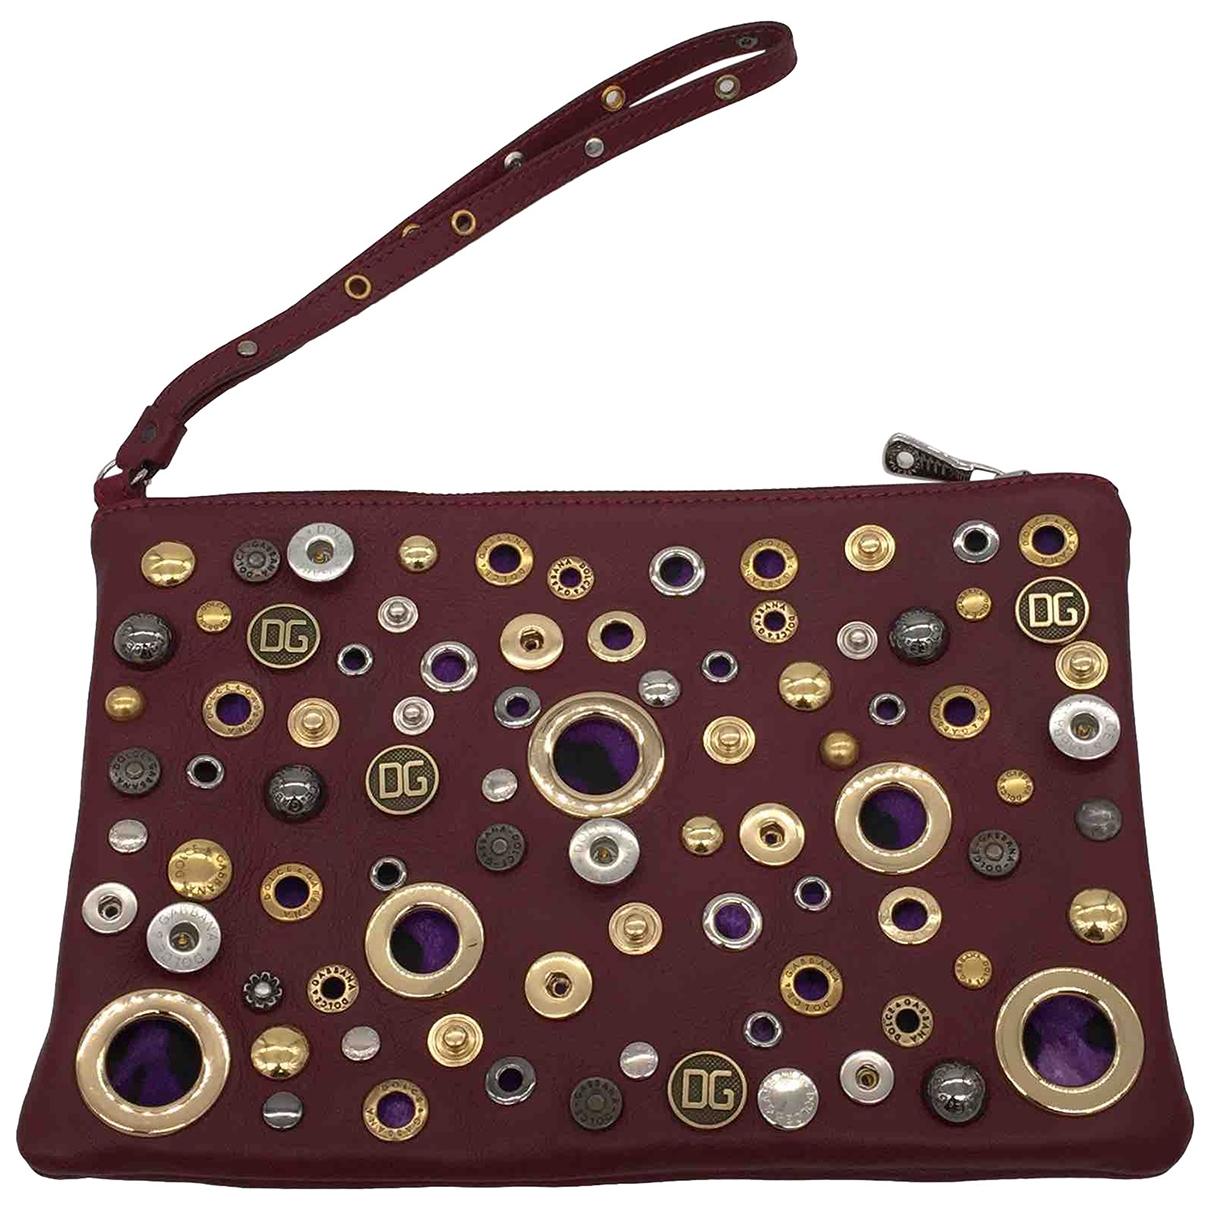 Dolce & Gabbana \N Burgundy Leather Clutch bag for Women \N